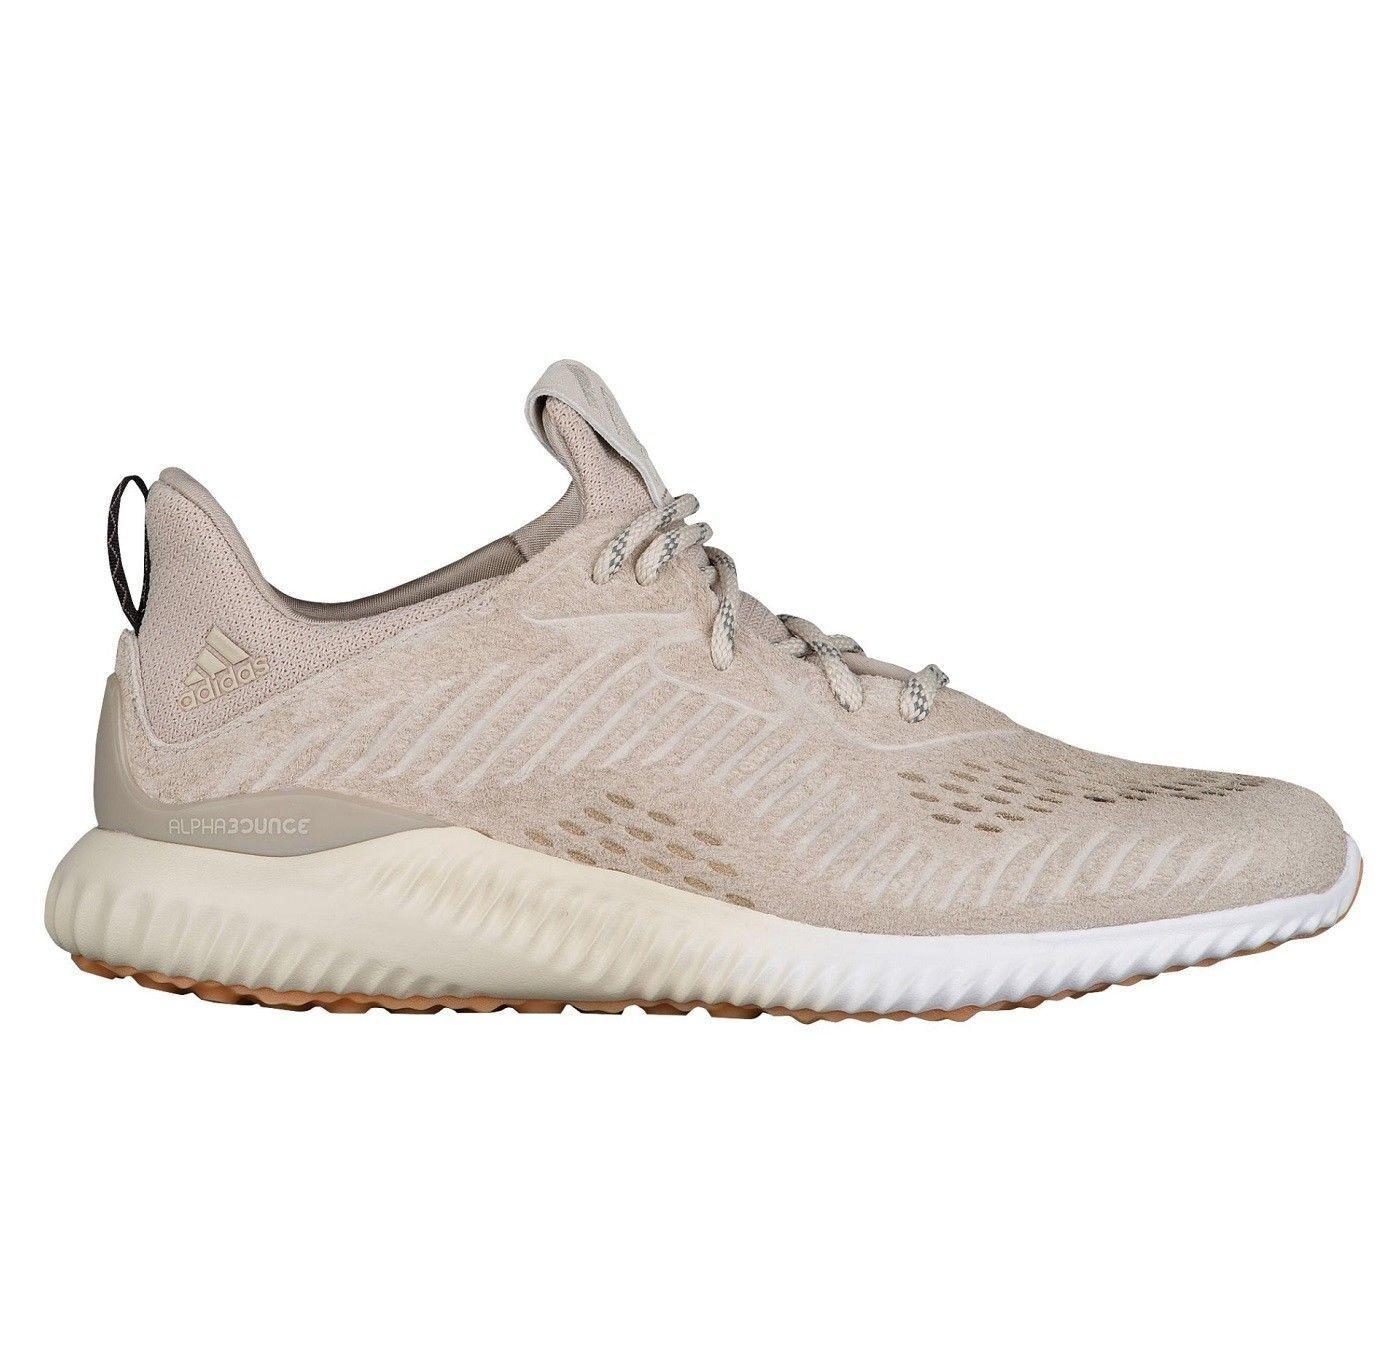 Men's Adidas Alphabounce Sz LEA Running Shoes Brown Cobblestone Sz Alphabounce 11.5 BY3122 457026